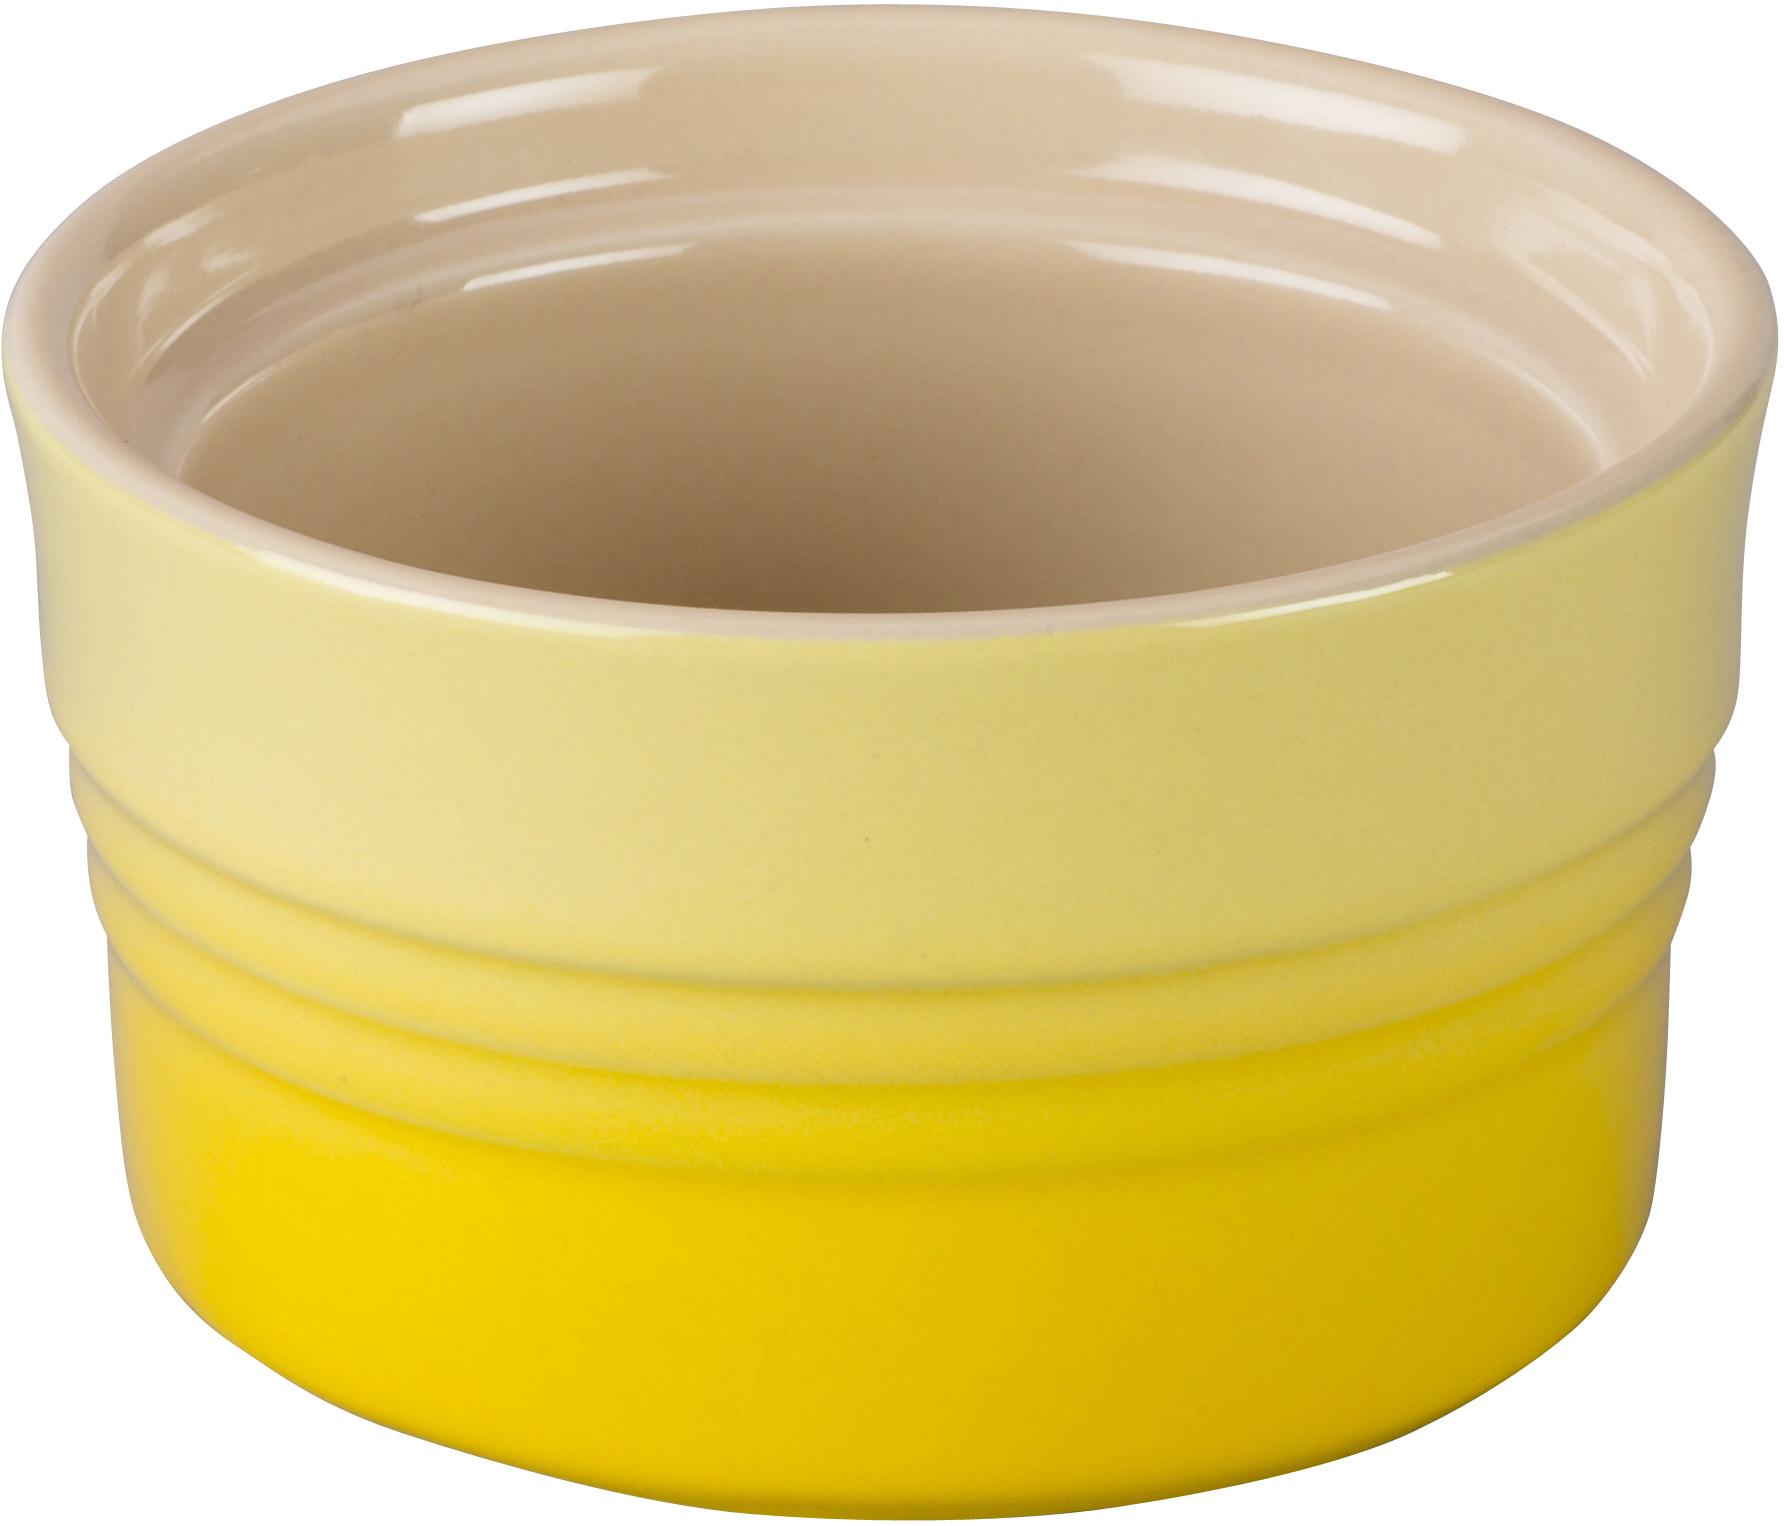 Le Creuset Soleil Yellow Stoneware Stackable Ramekin, 7 Ounce